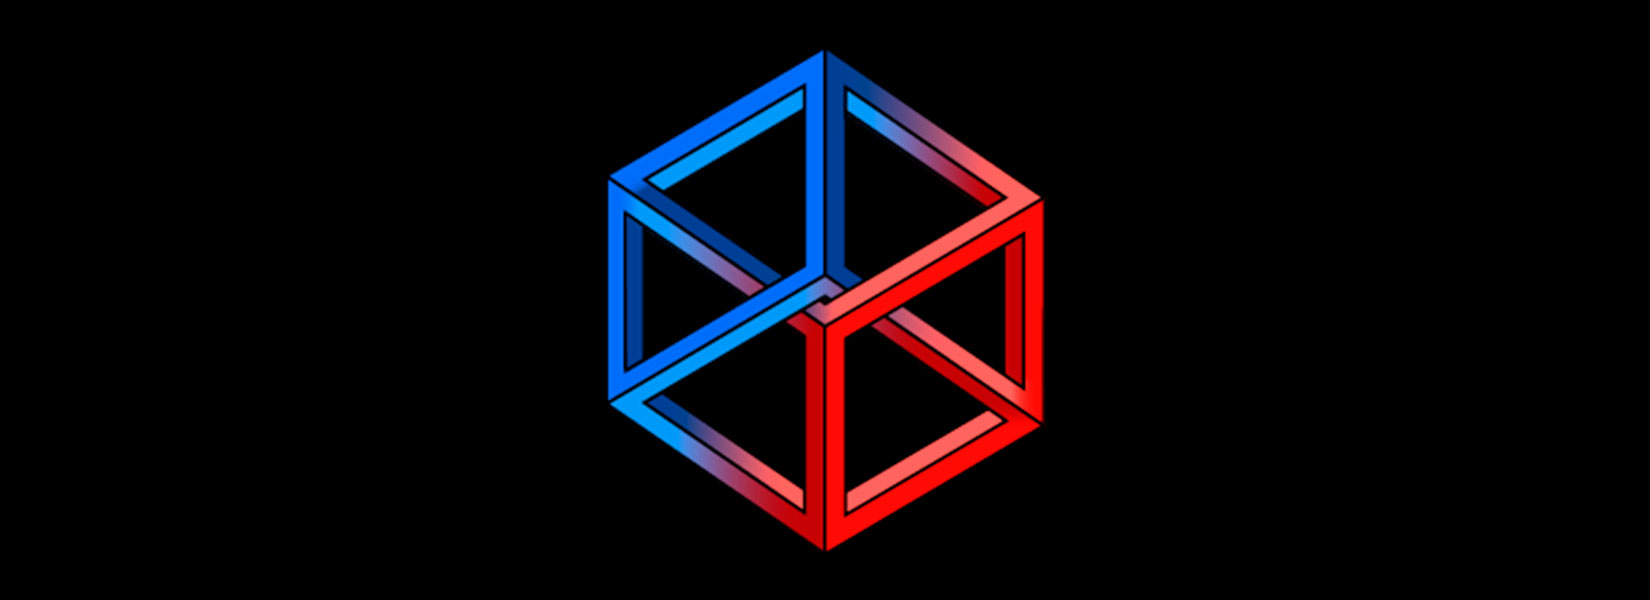 Pixel Machinist Brand Design / Emanate Design